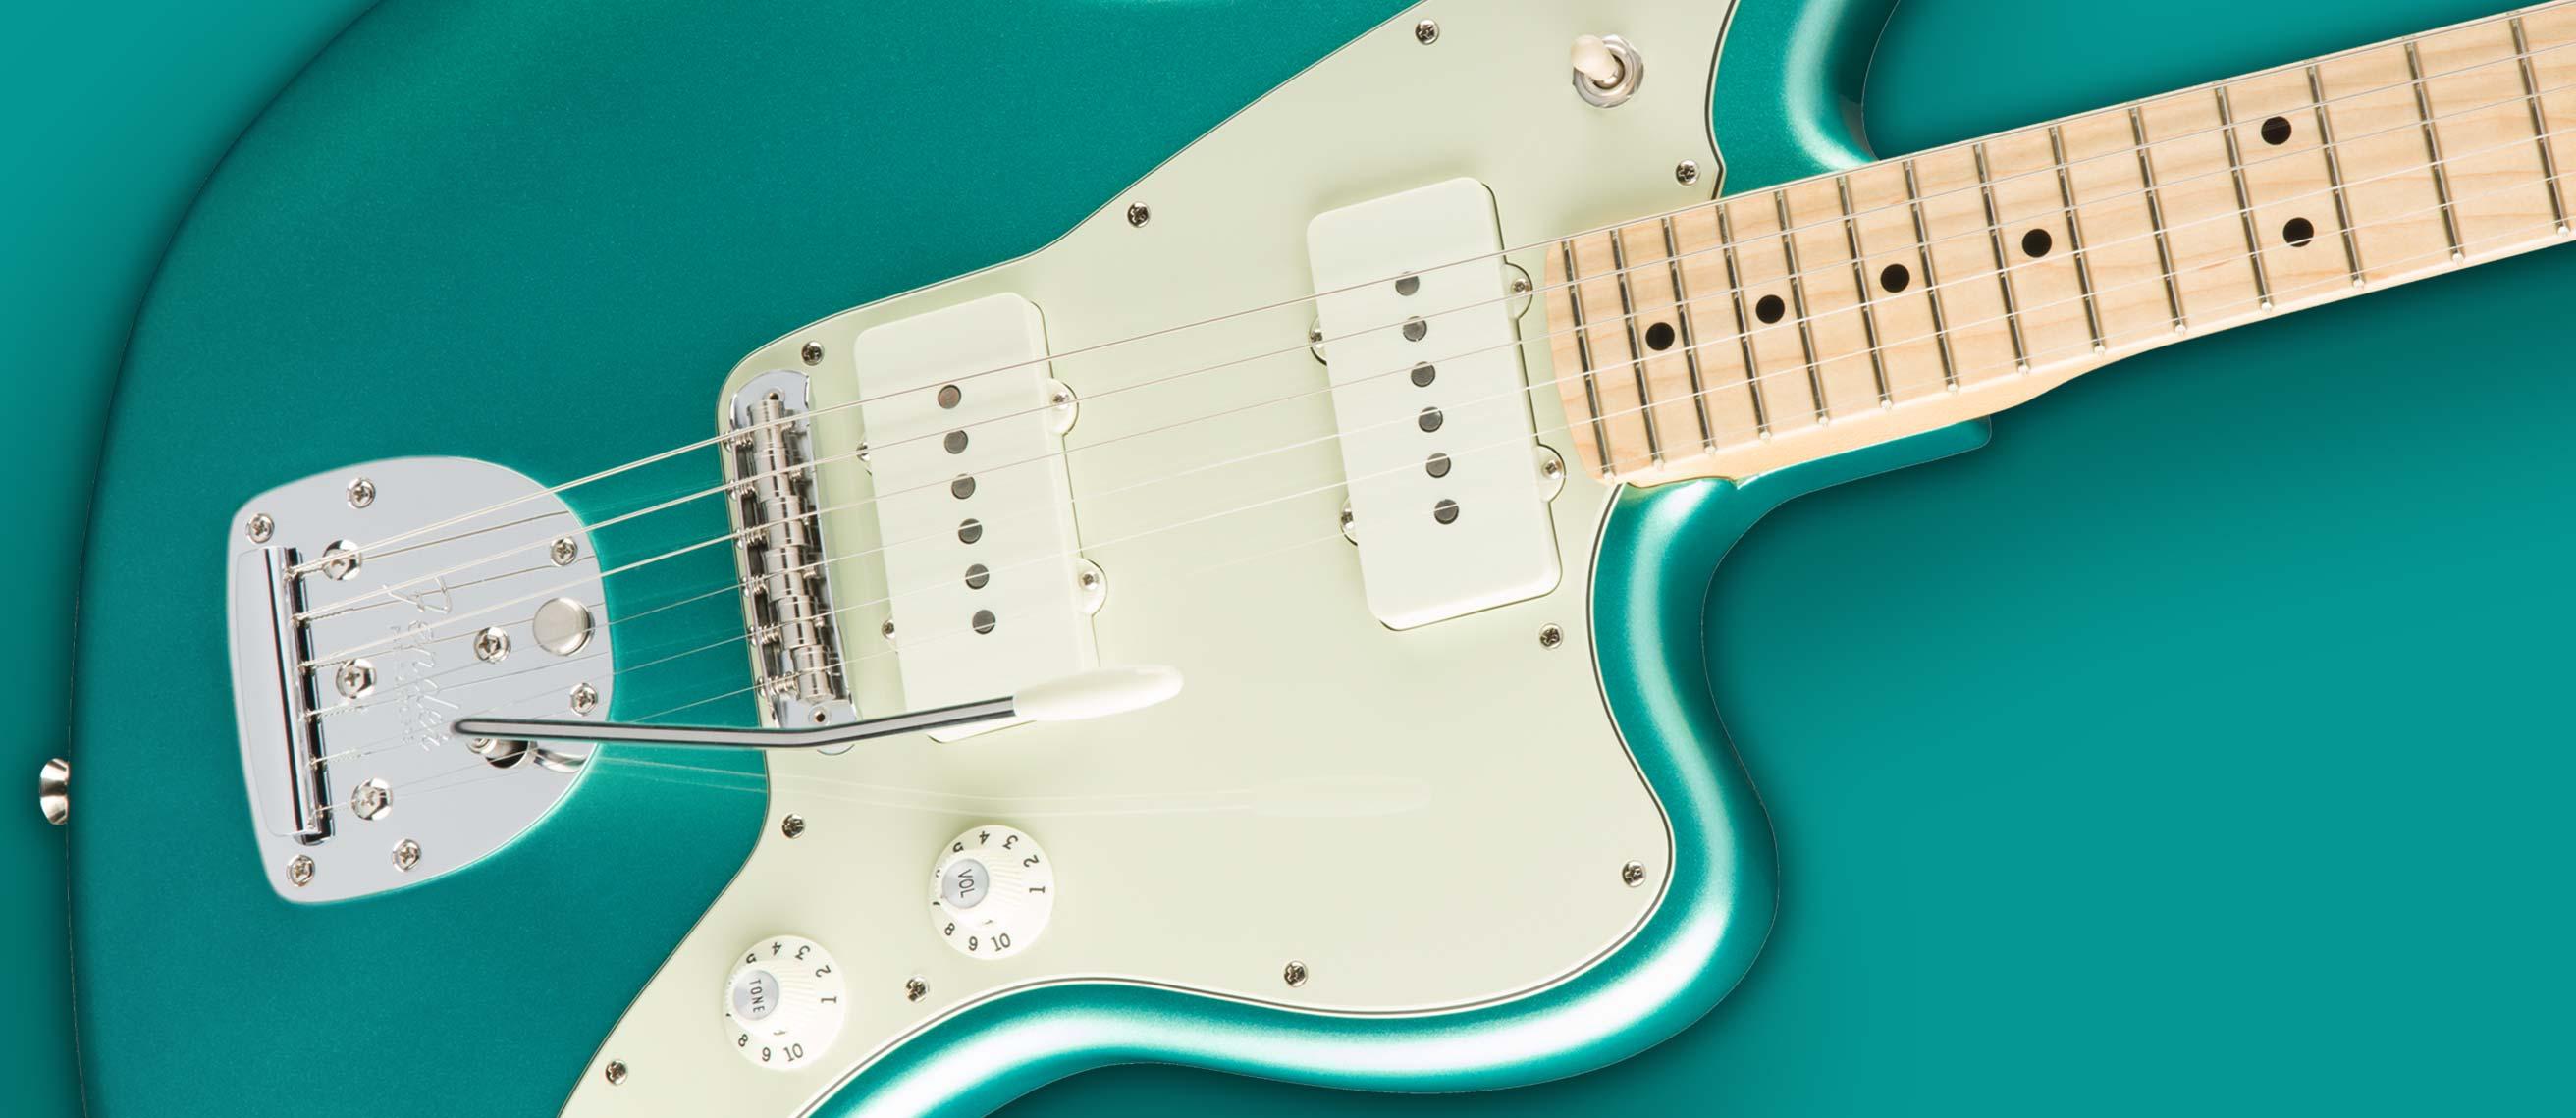 Mosrite Guitar Wiring Diagram Kawasaki Mule 600 Diagramsc Strat Fender Esp 16349 Jazzmaster Heroresizeu003d6652c289